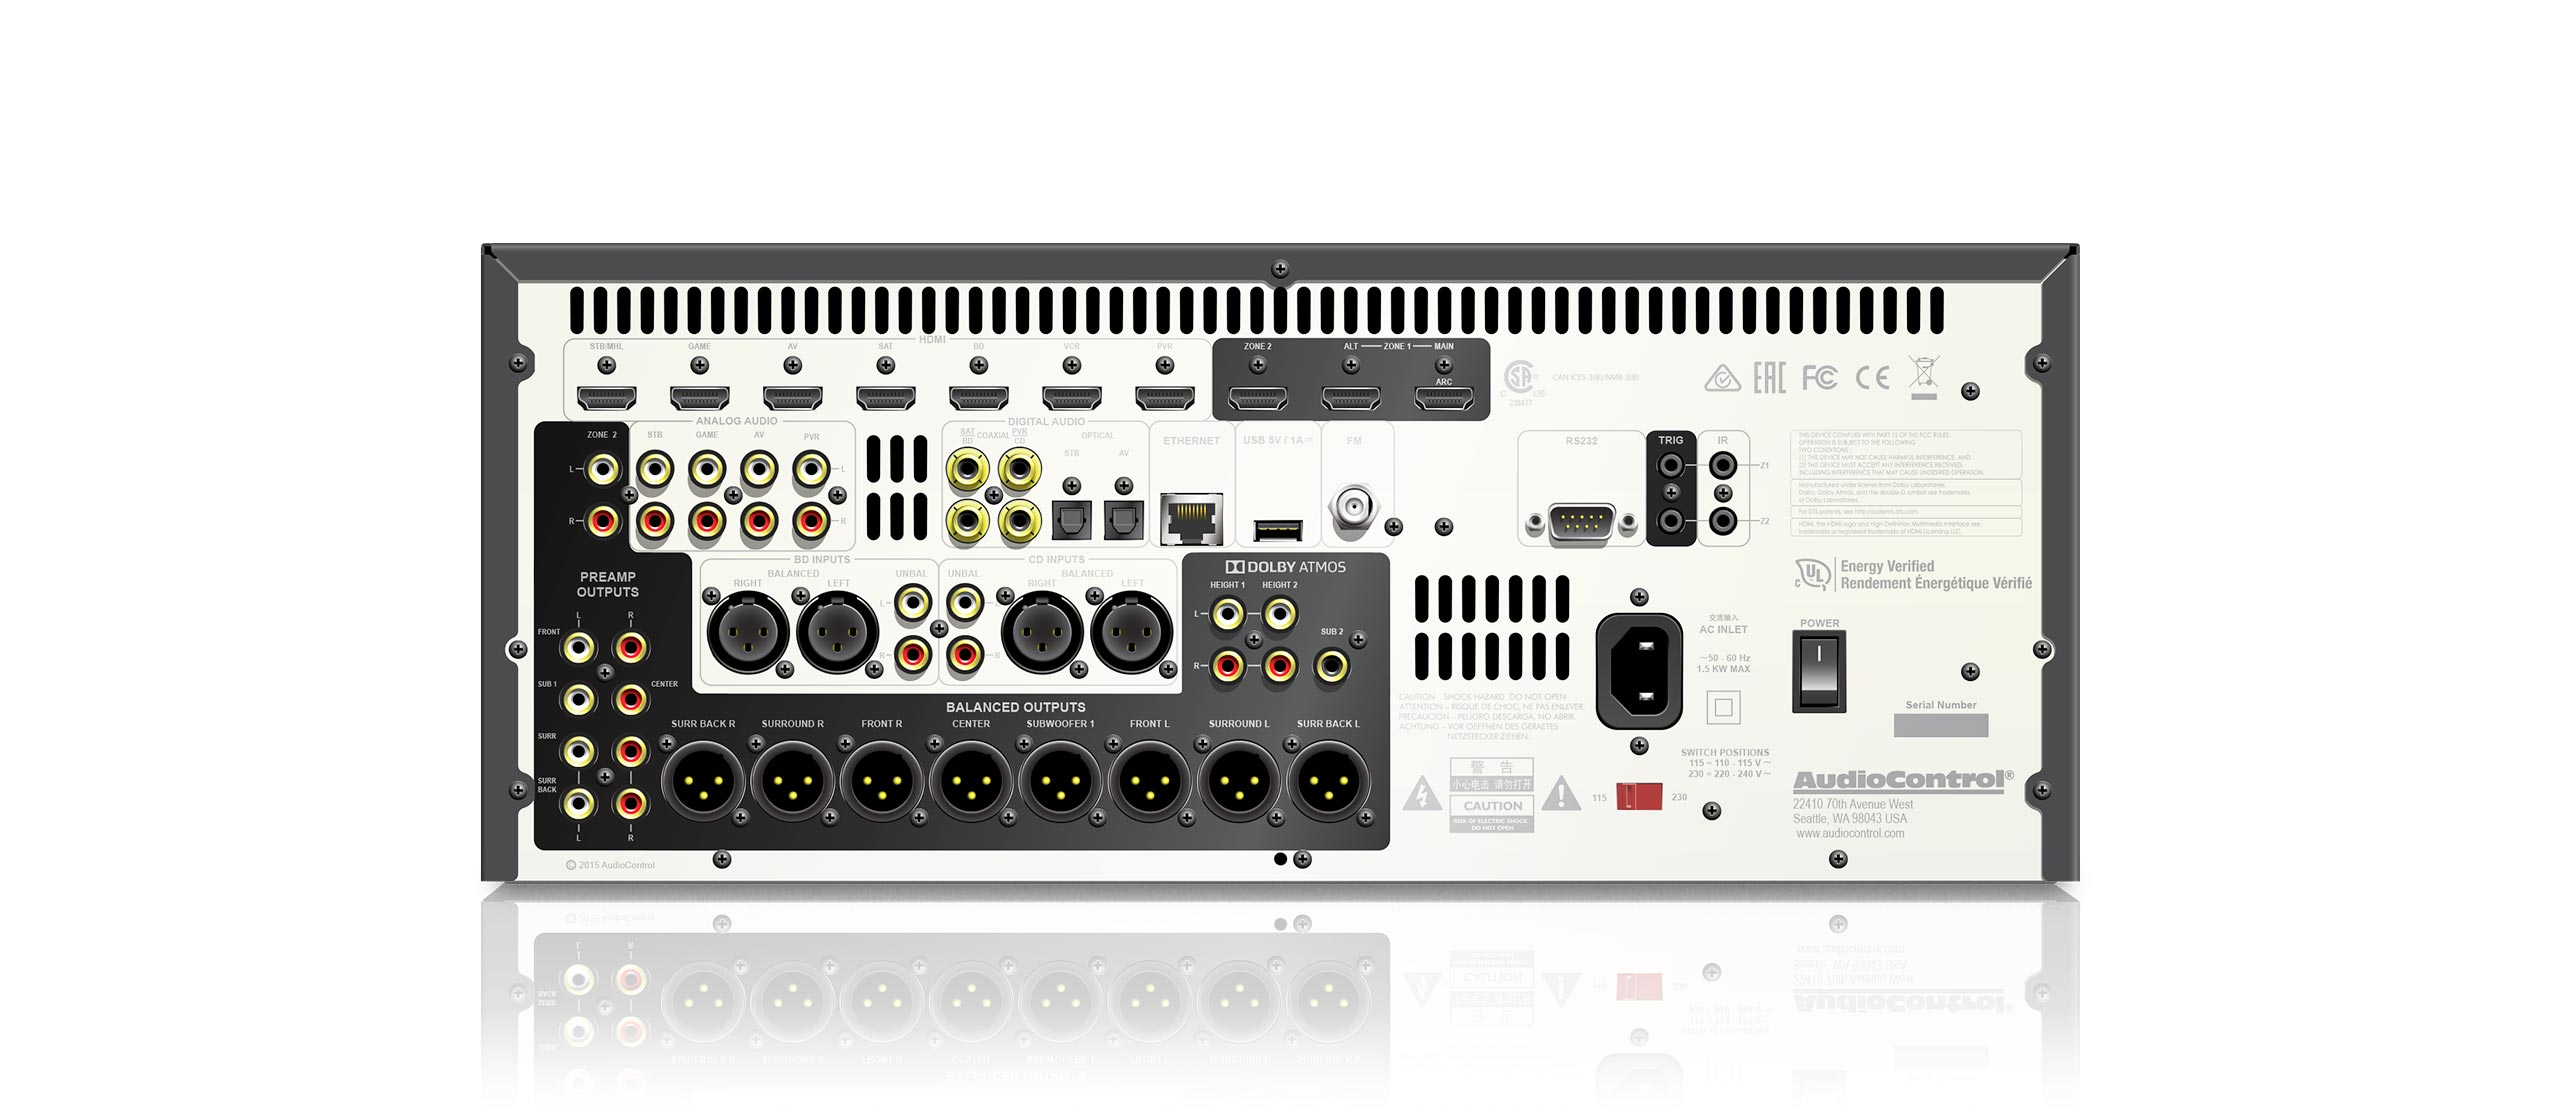 maestro m9 audiocontrol. Black Bedroom Furniture Sets. Home Design Ideas